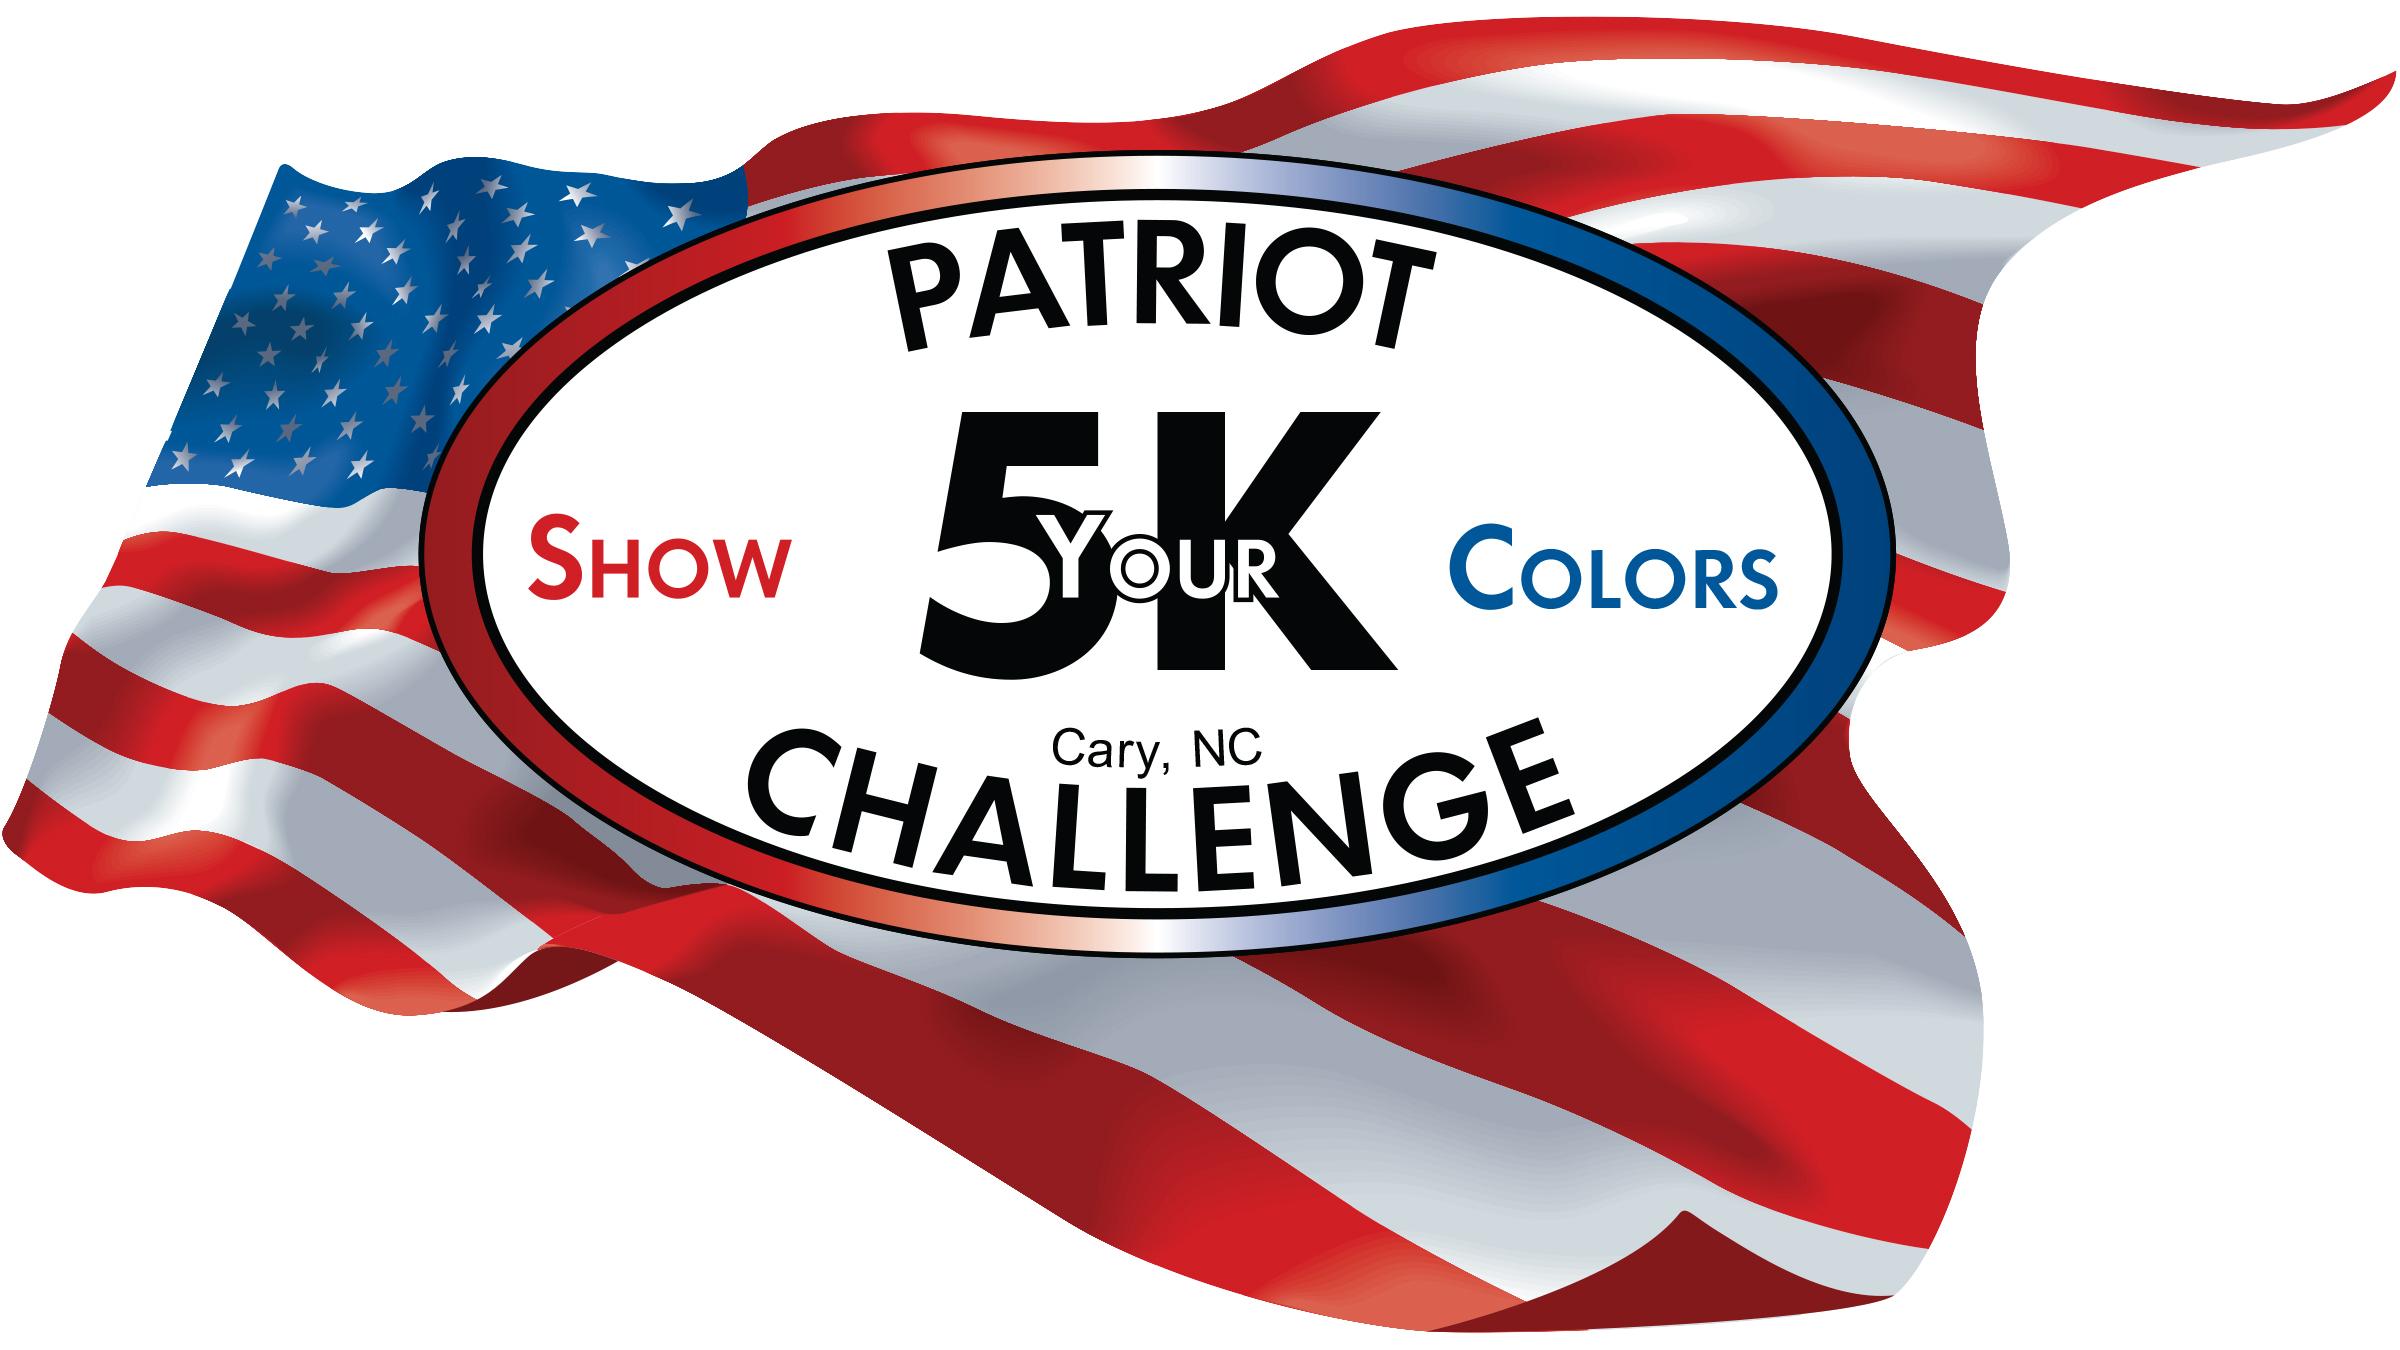 Patriot Challenge 5K logo.jpg